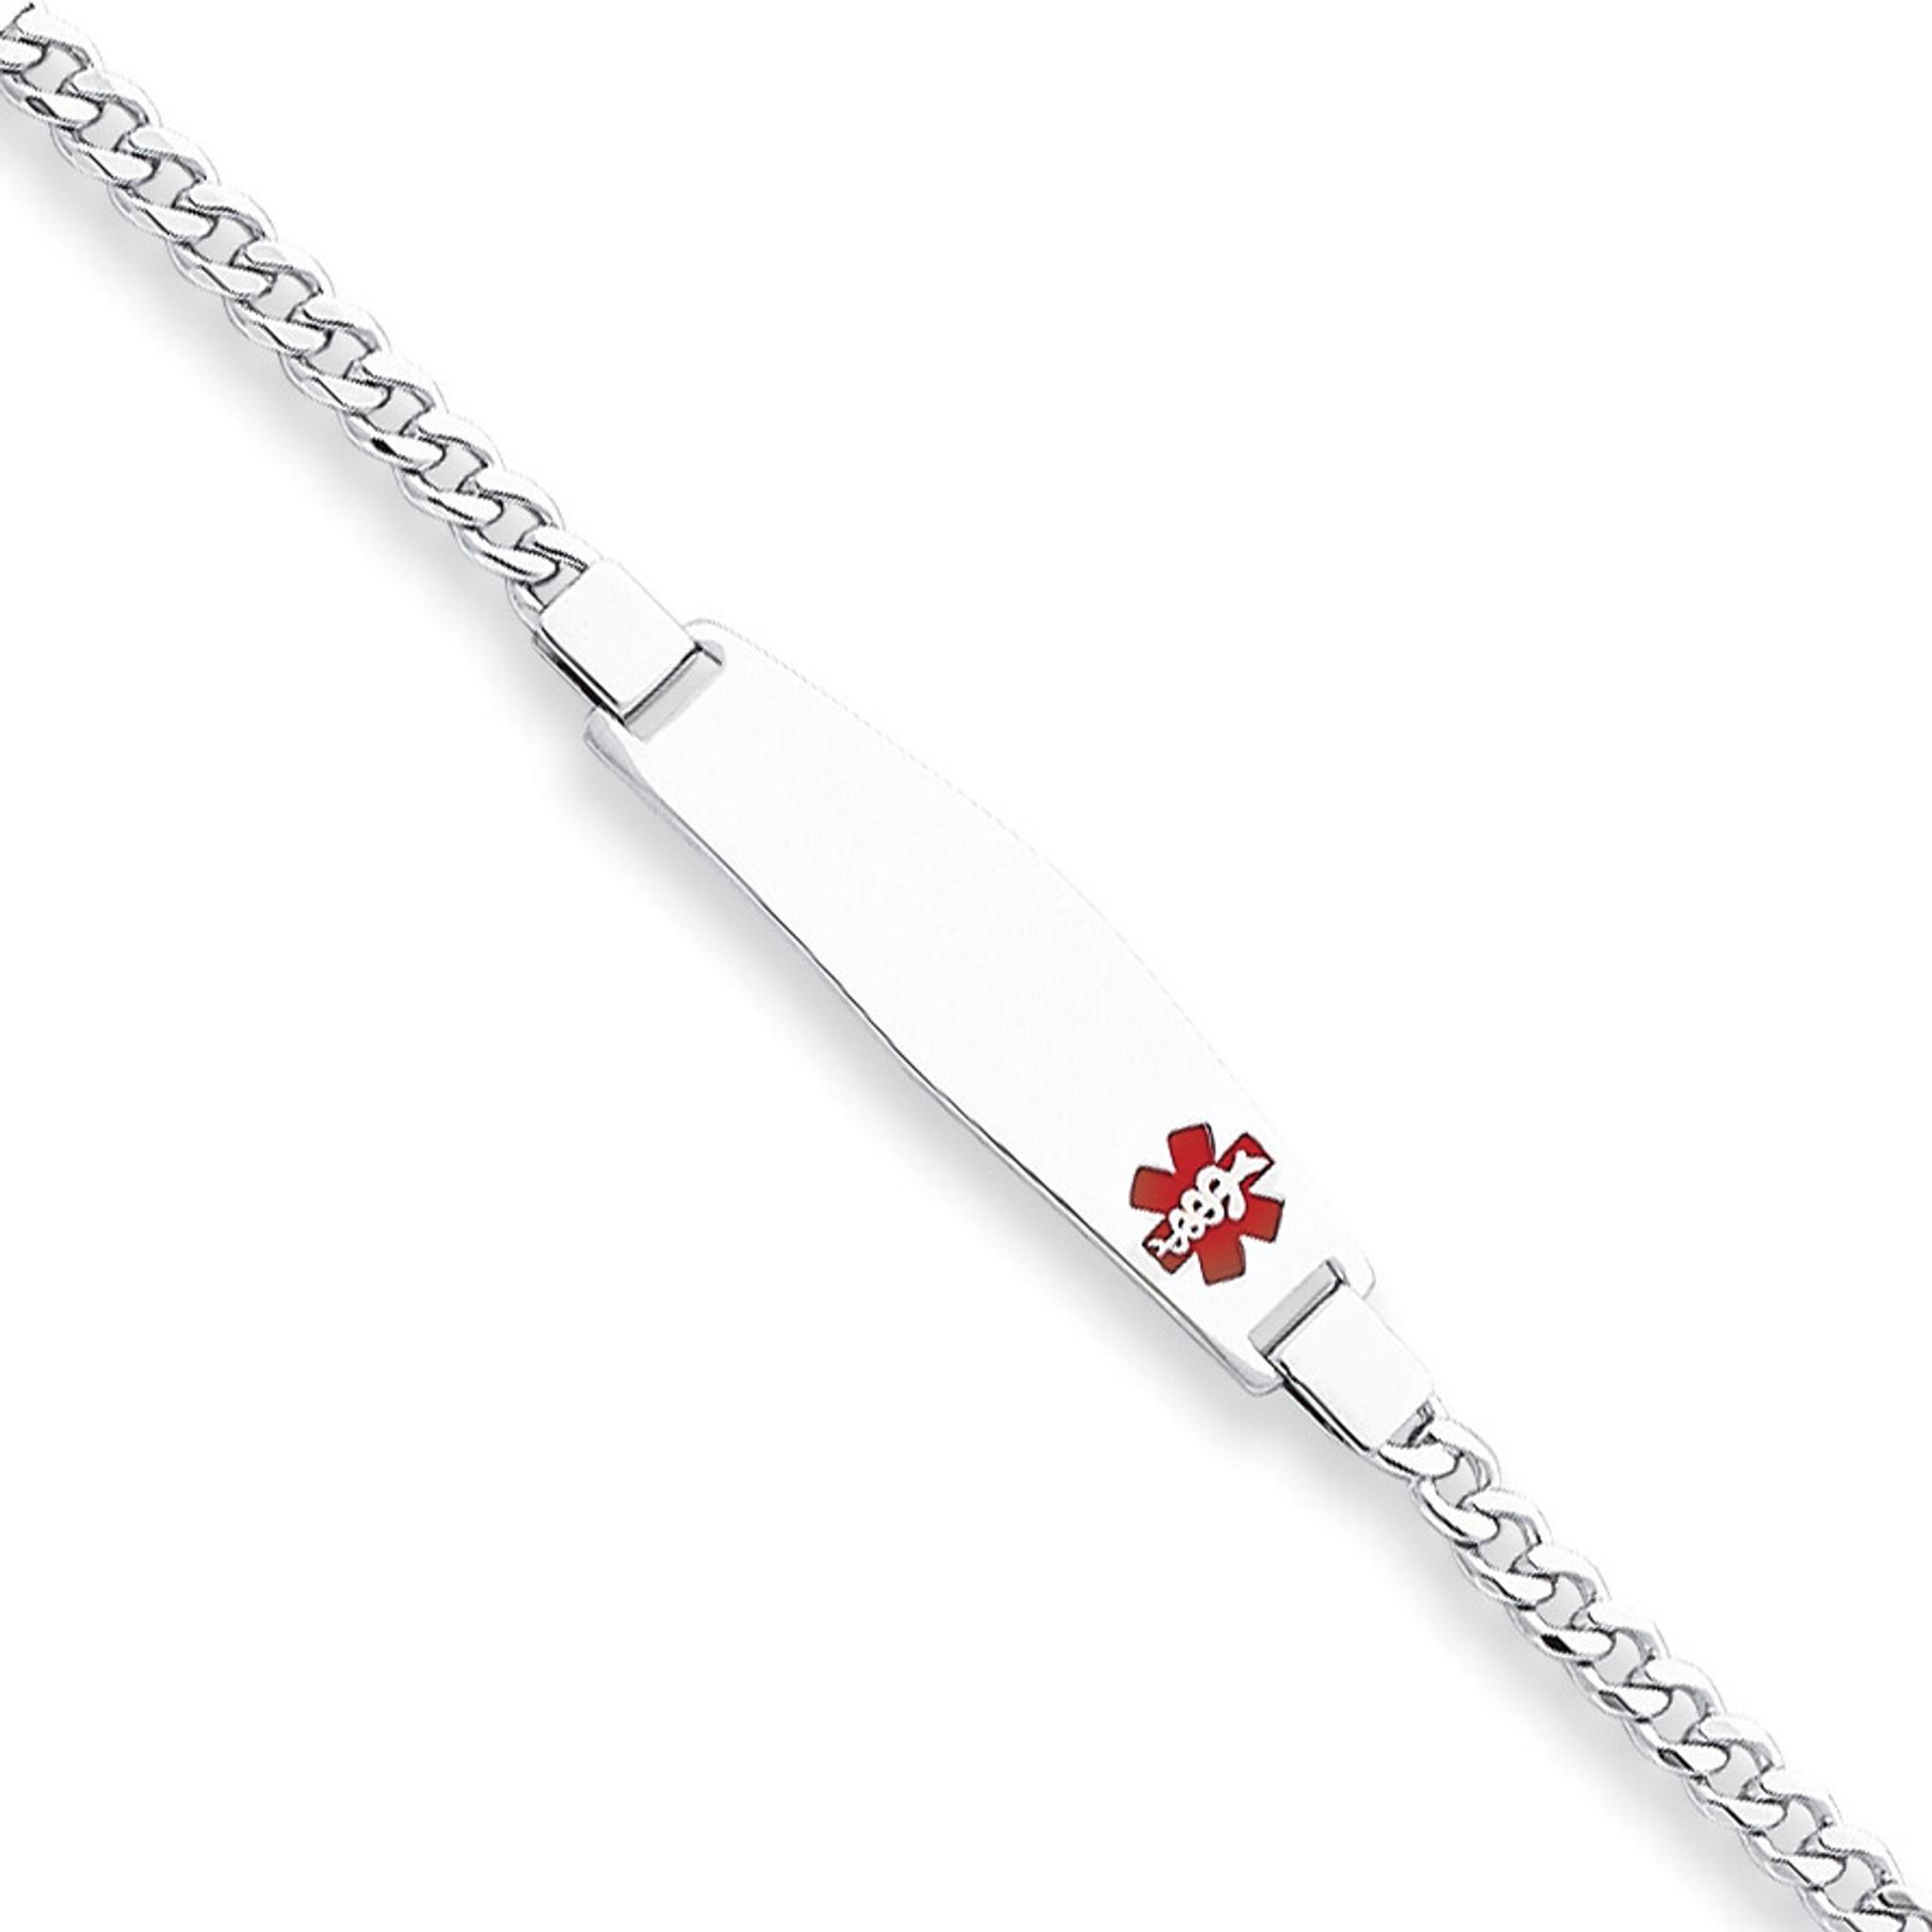 Steel Raindrop Pre-Engraved /& Customized High Blood Pressure Bracelet Red Symbol My Identity Doctor